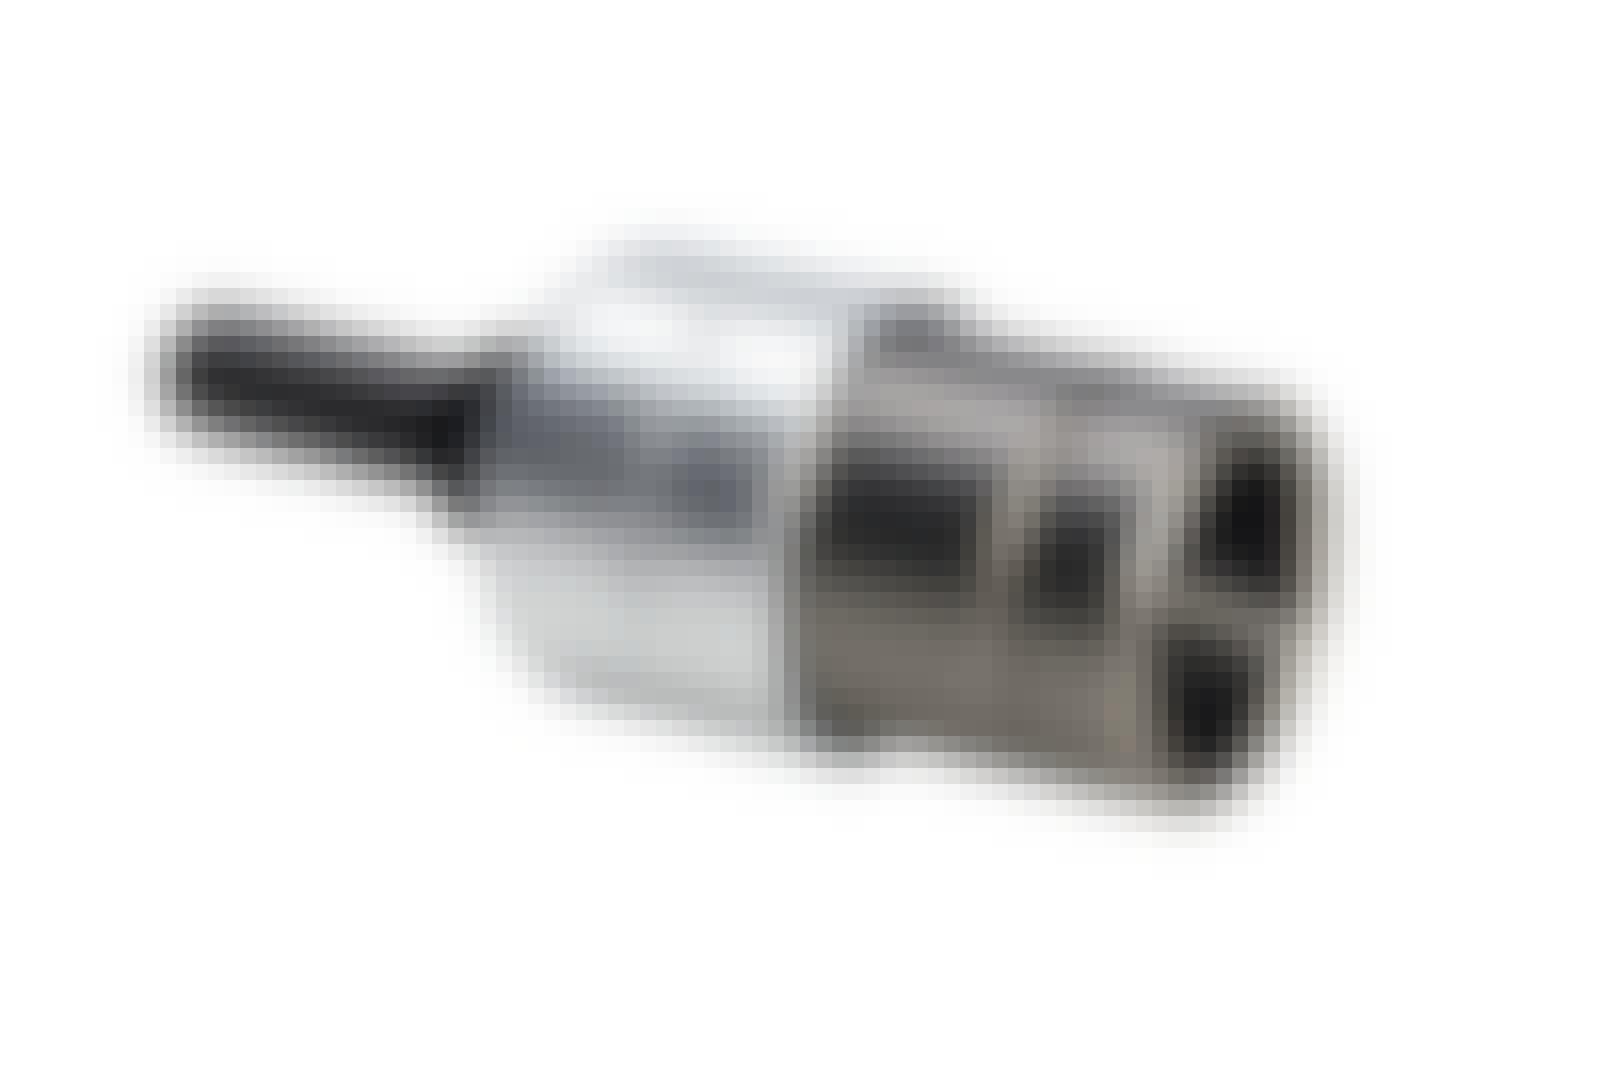 Gipsskrumaskin: En gipsbits er et billig alternativ til en gipsskrumaskin